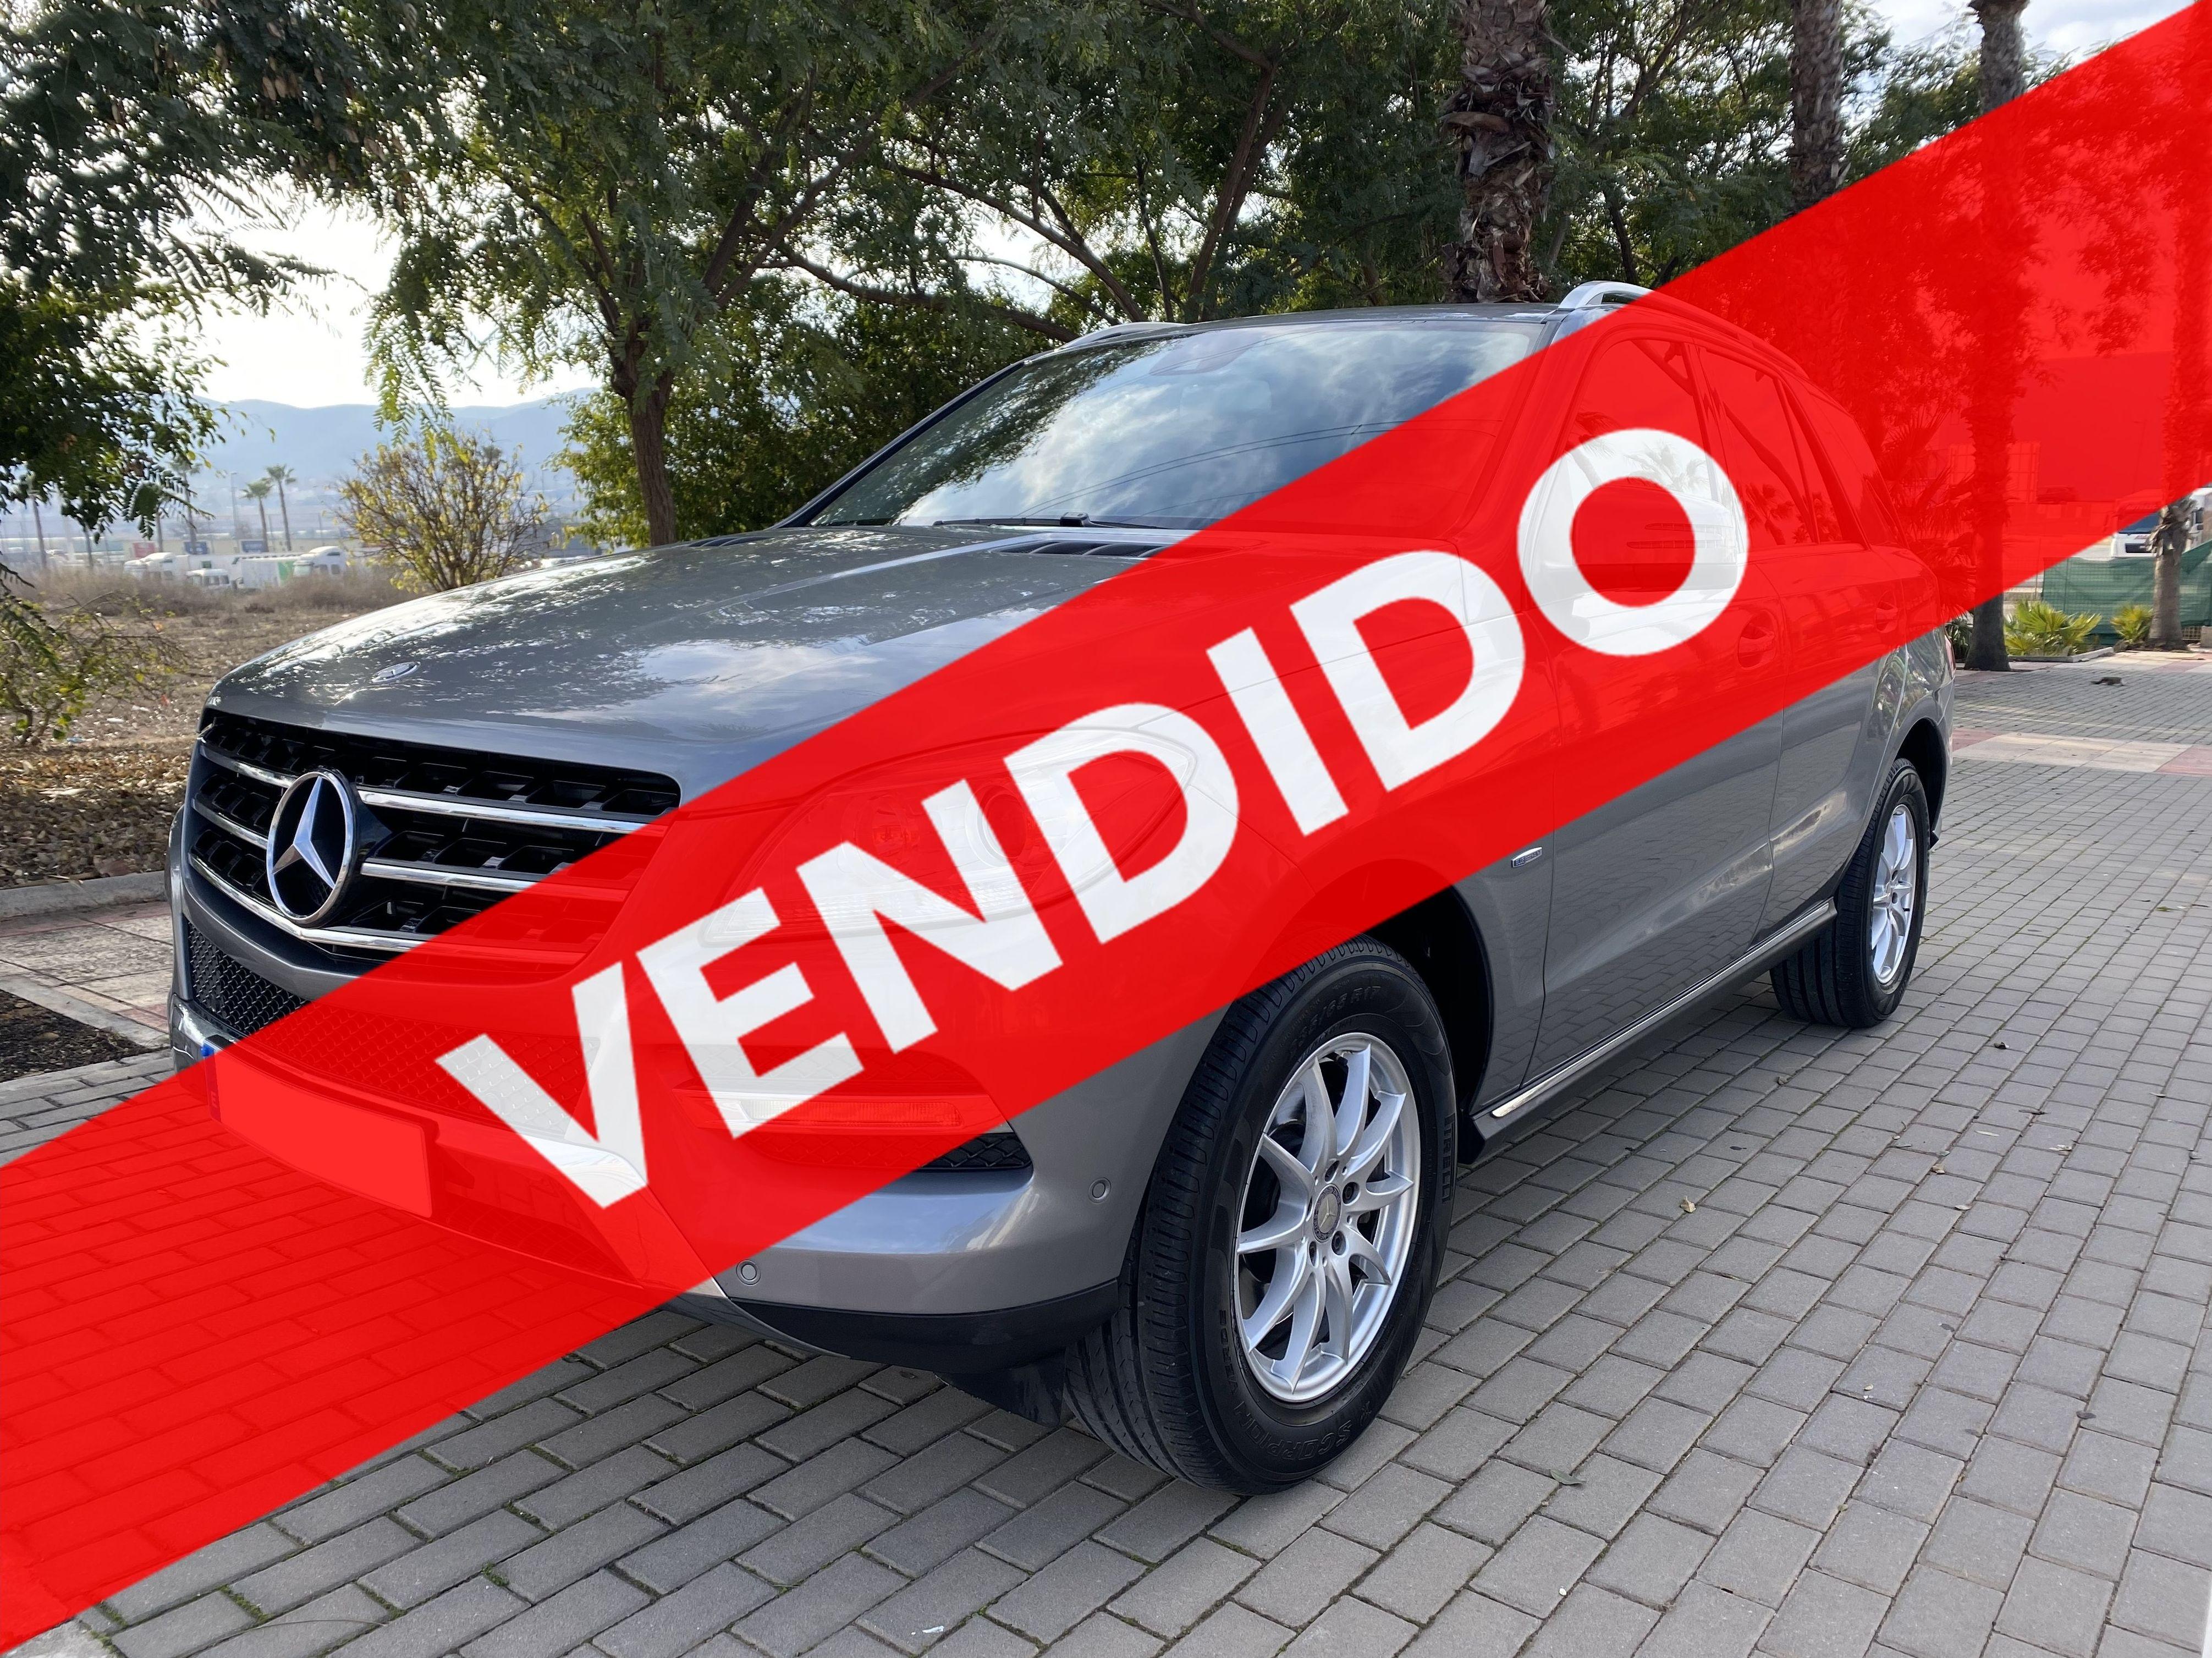 MERCEDES BENZ ML 250 CDI: COCHES DE OCASION de Automóviles Parque Mediterráneo